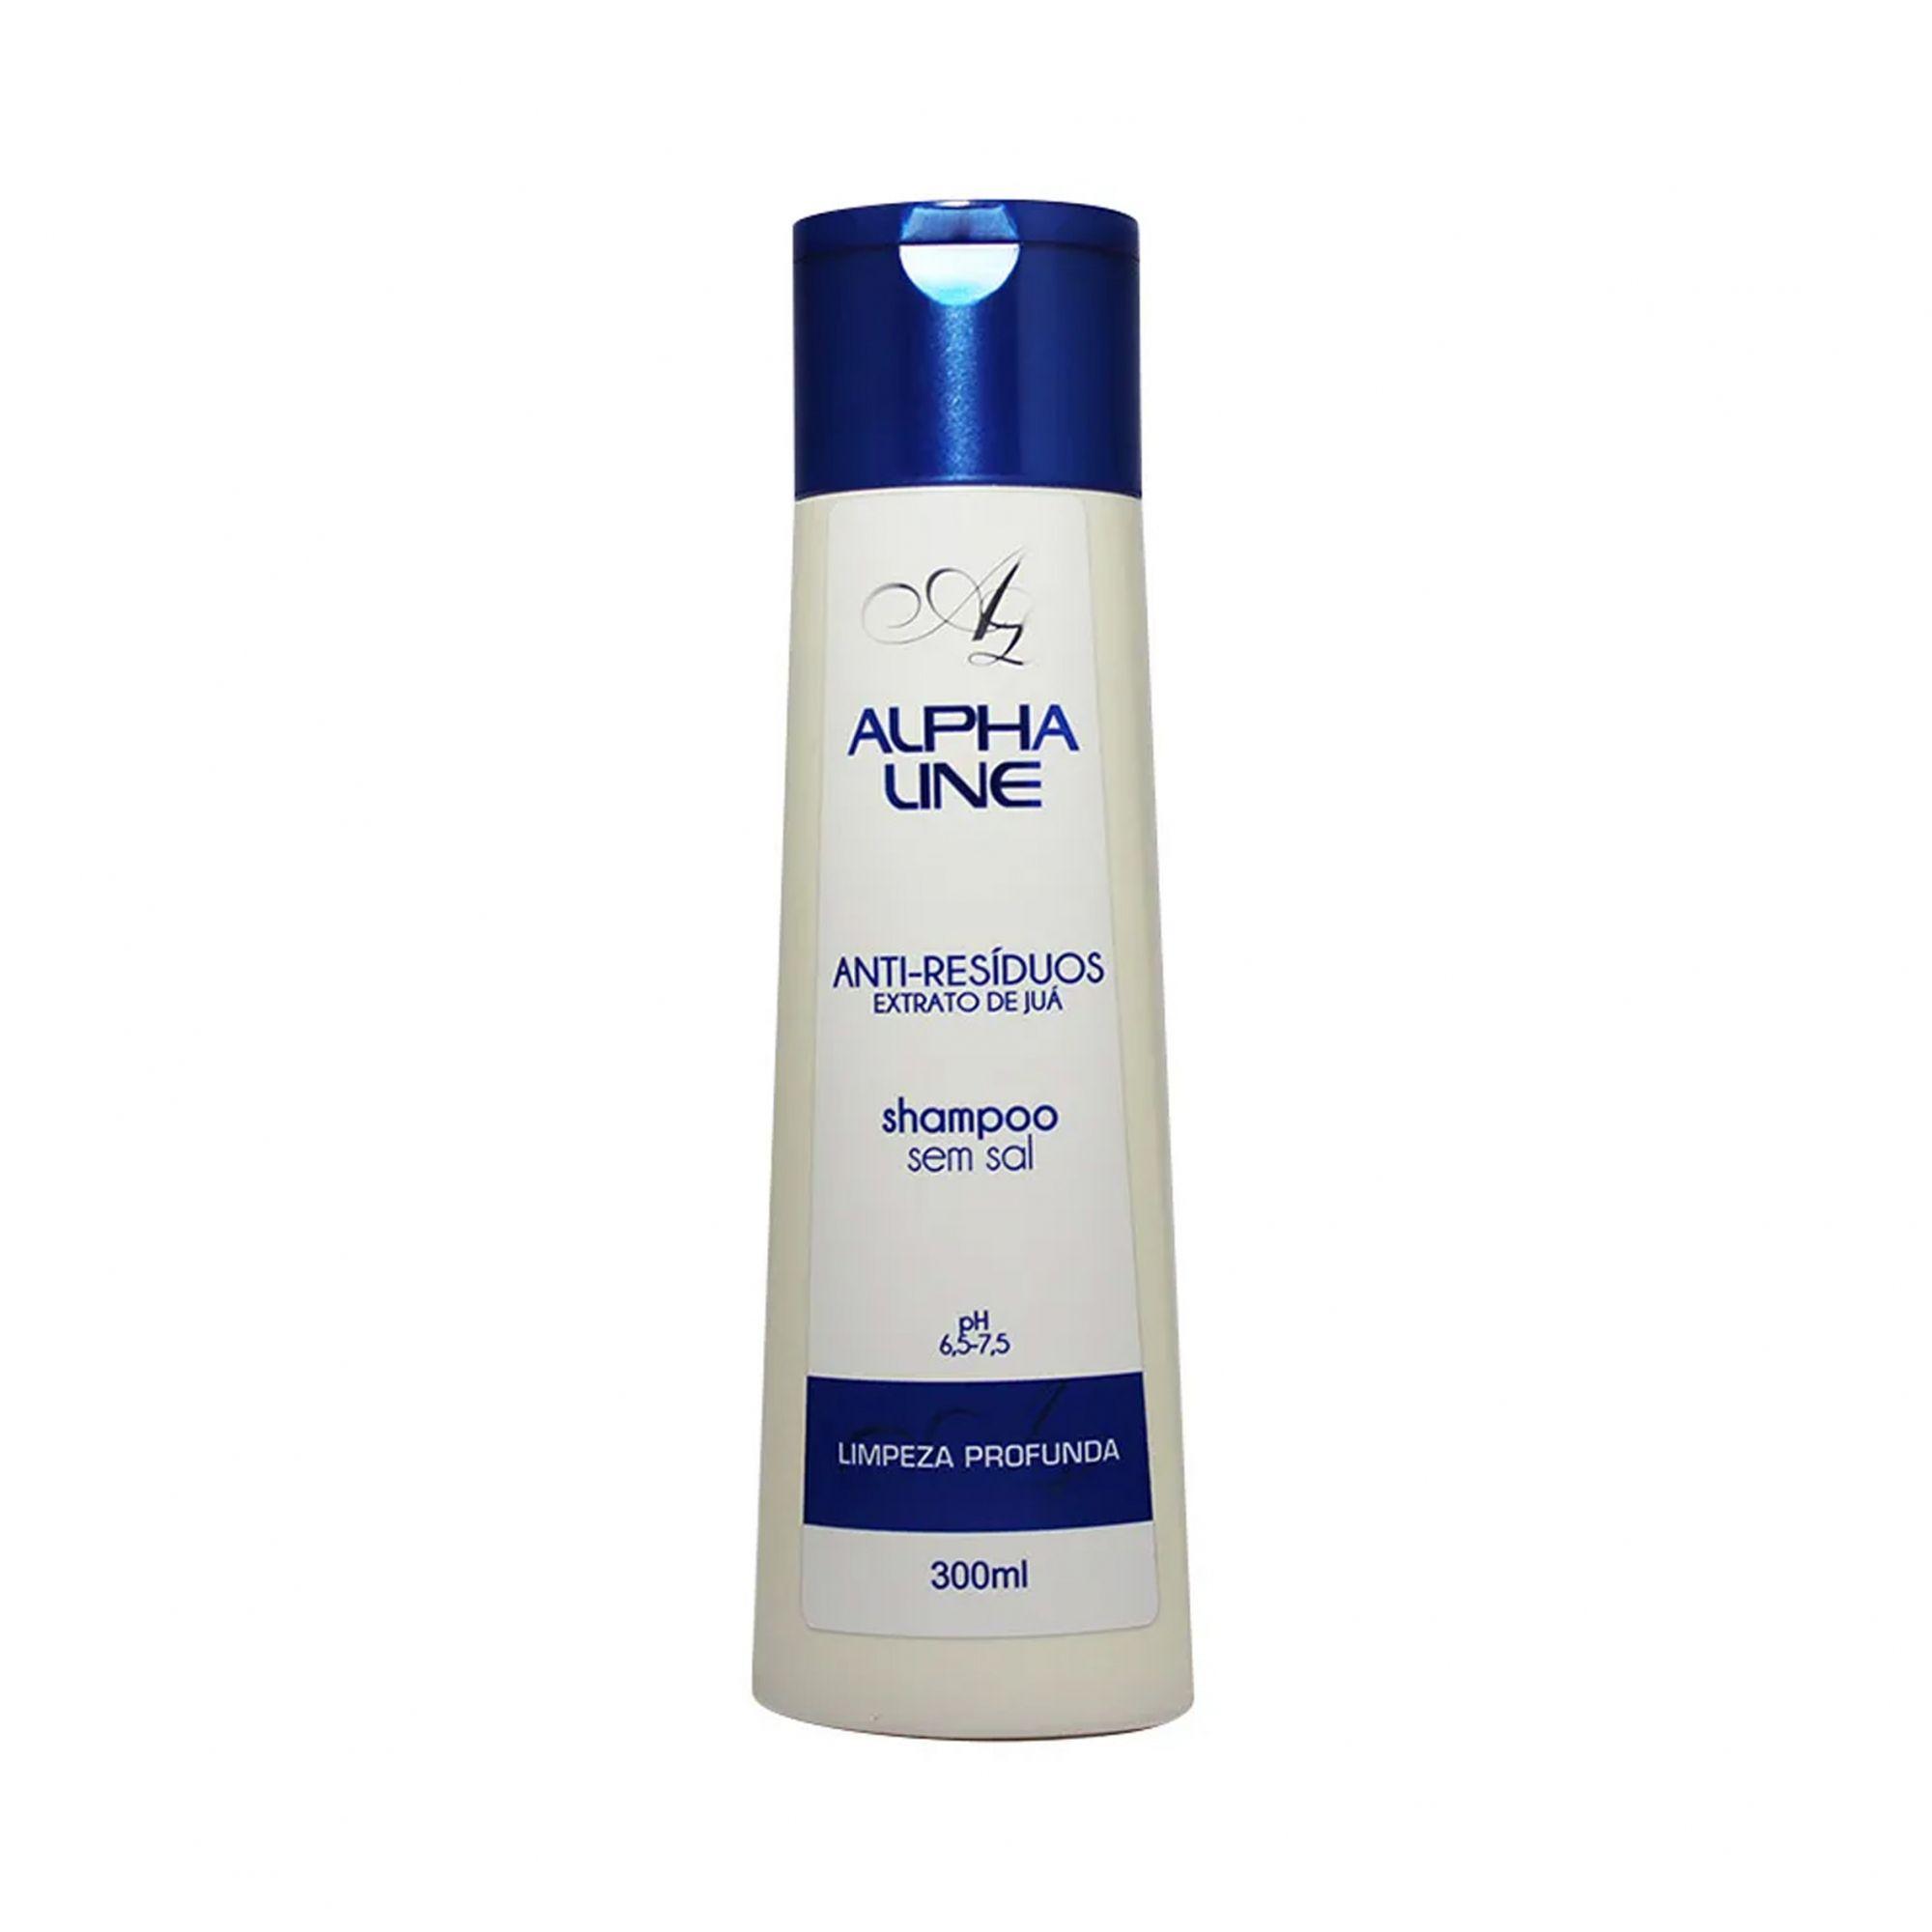 Shampoo Anti-Resíduos 300ml Alpha Line